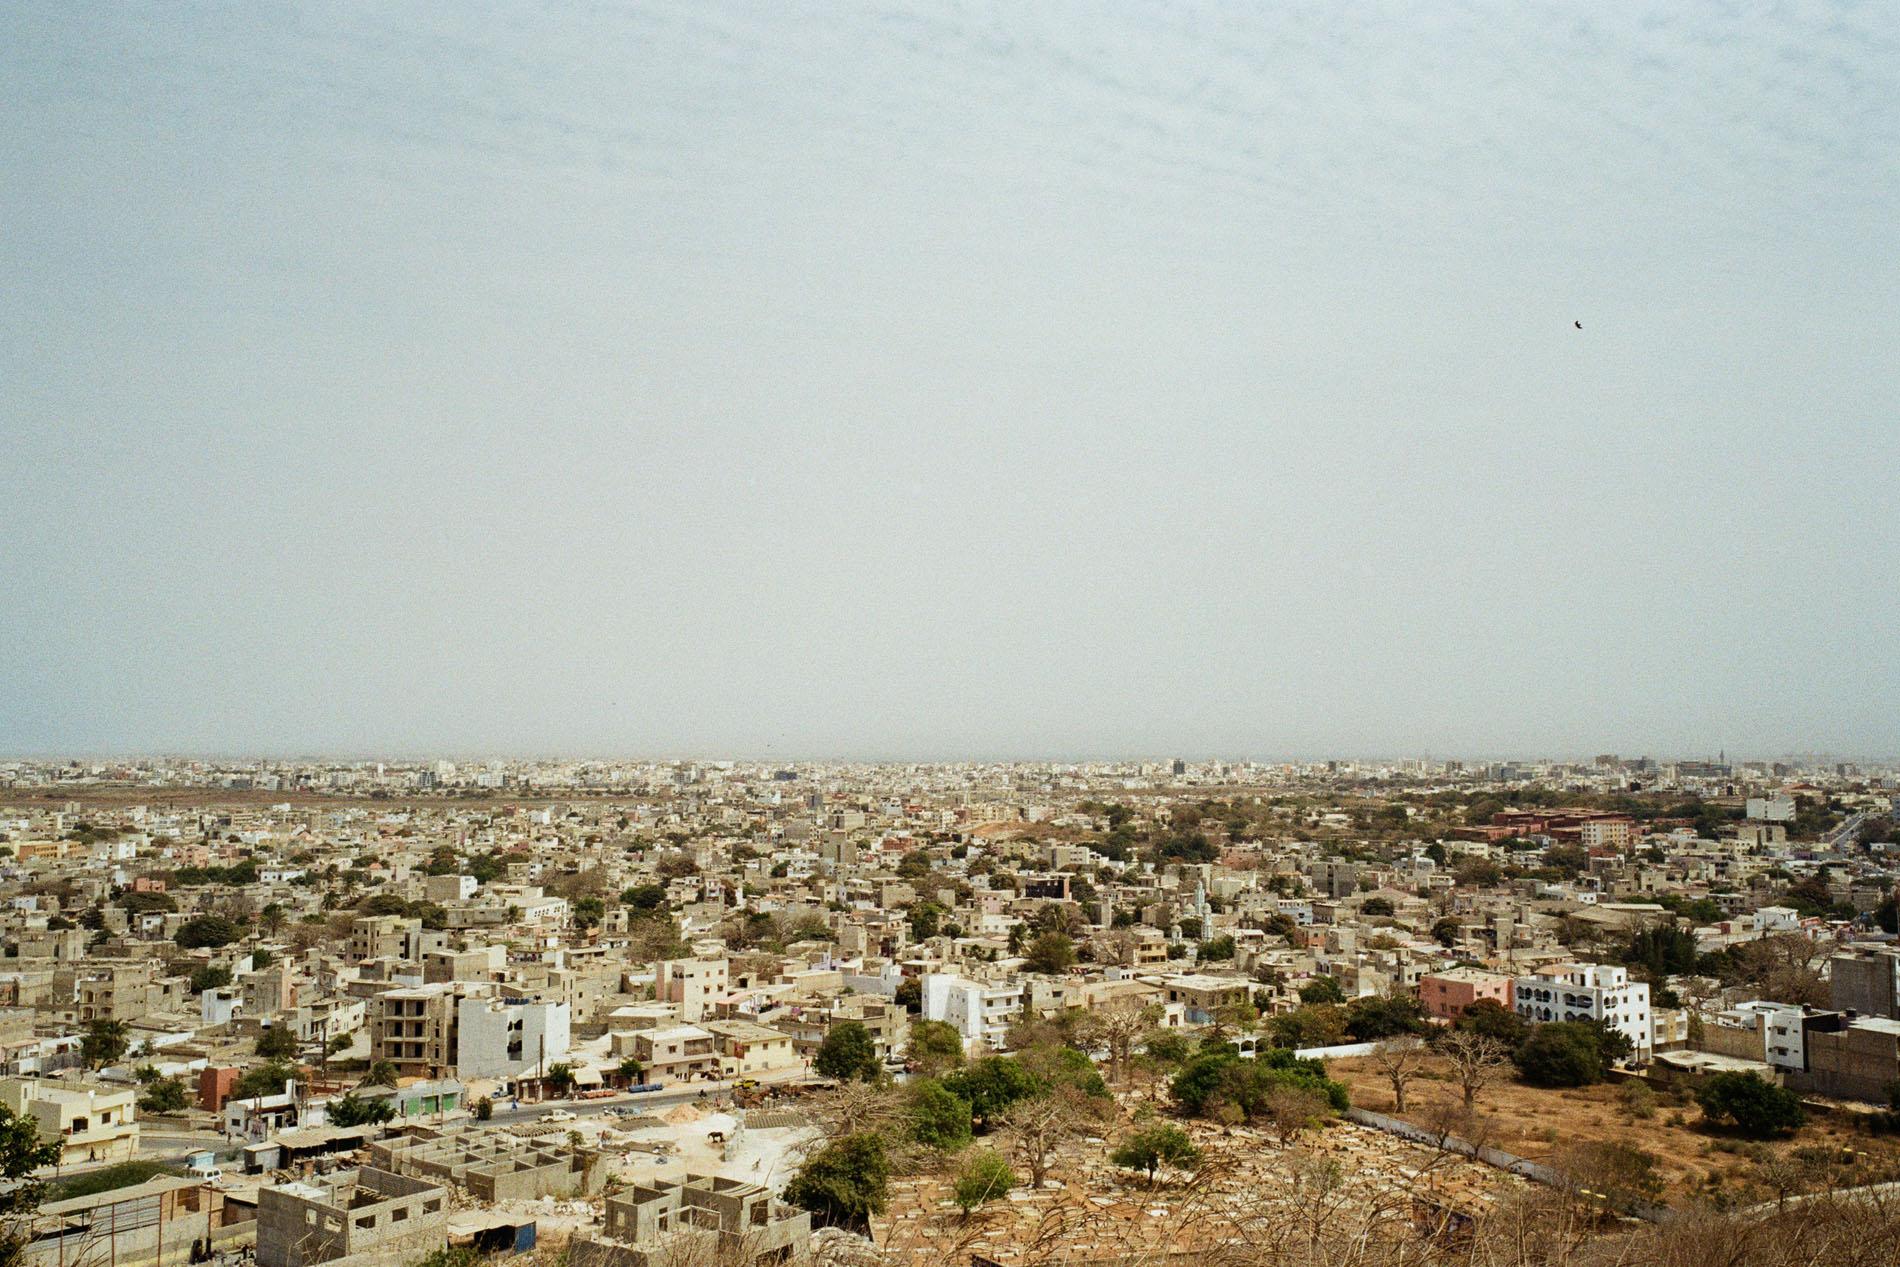 View to Dakar